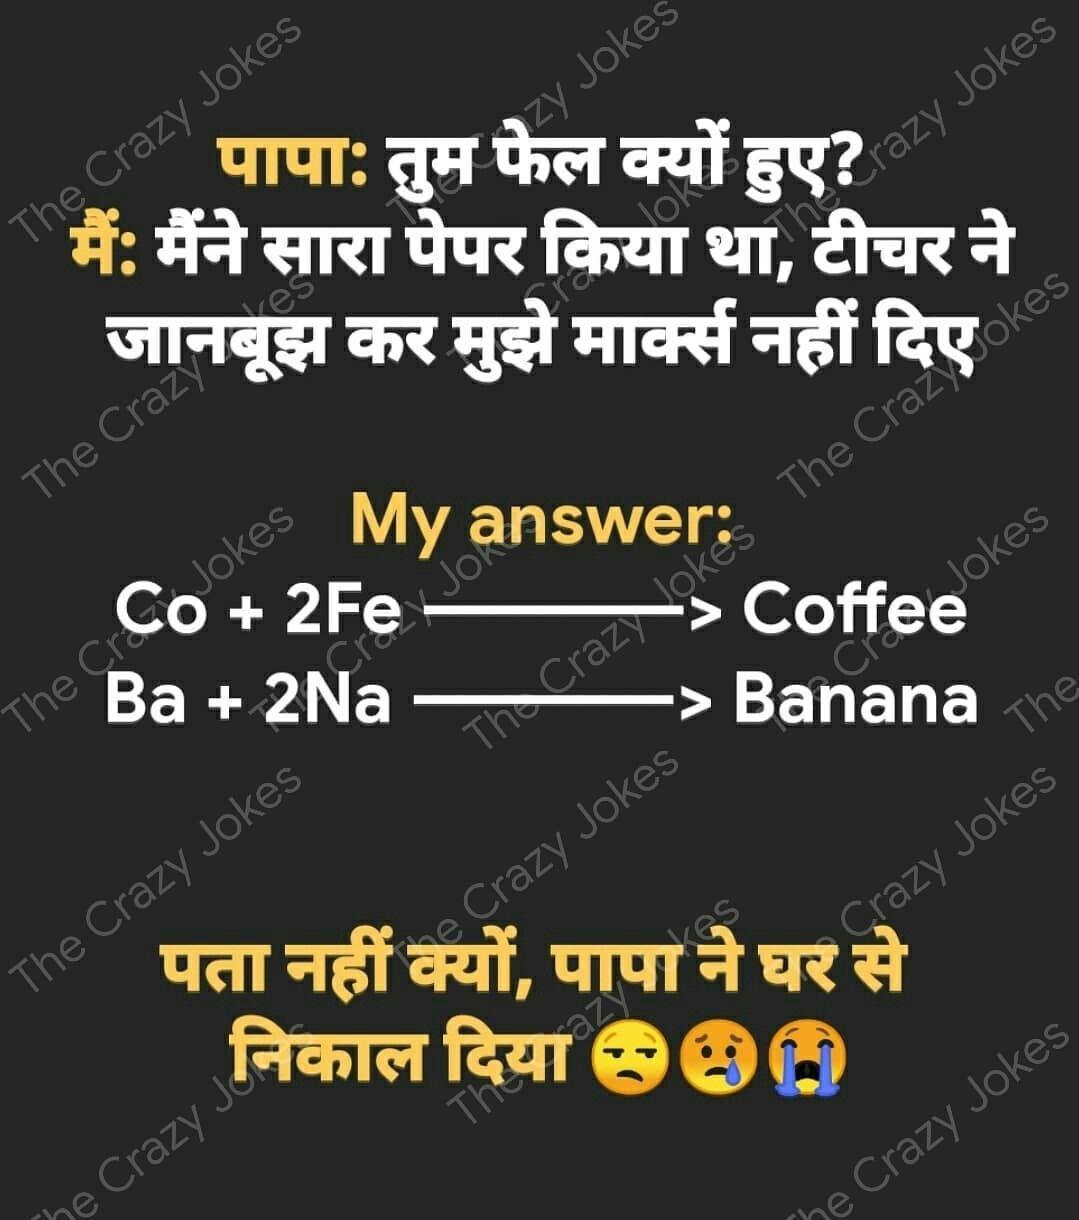 Pin By Siddique Shaikh On Quotes Crazy Jokes Jokes Zindagi Quotes